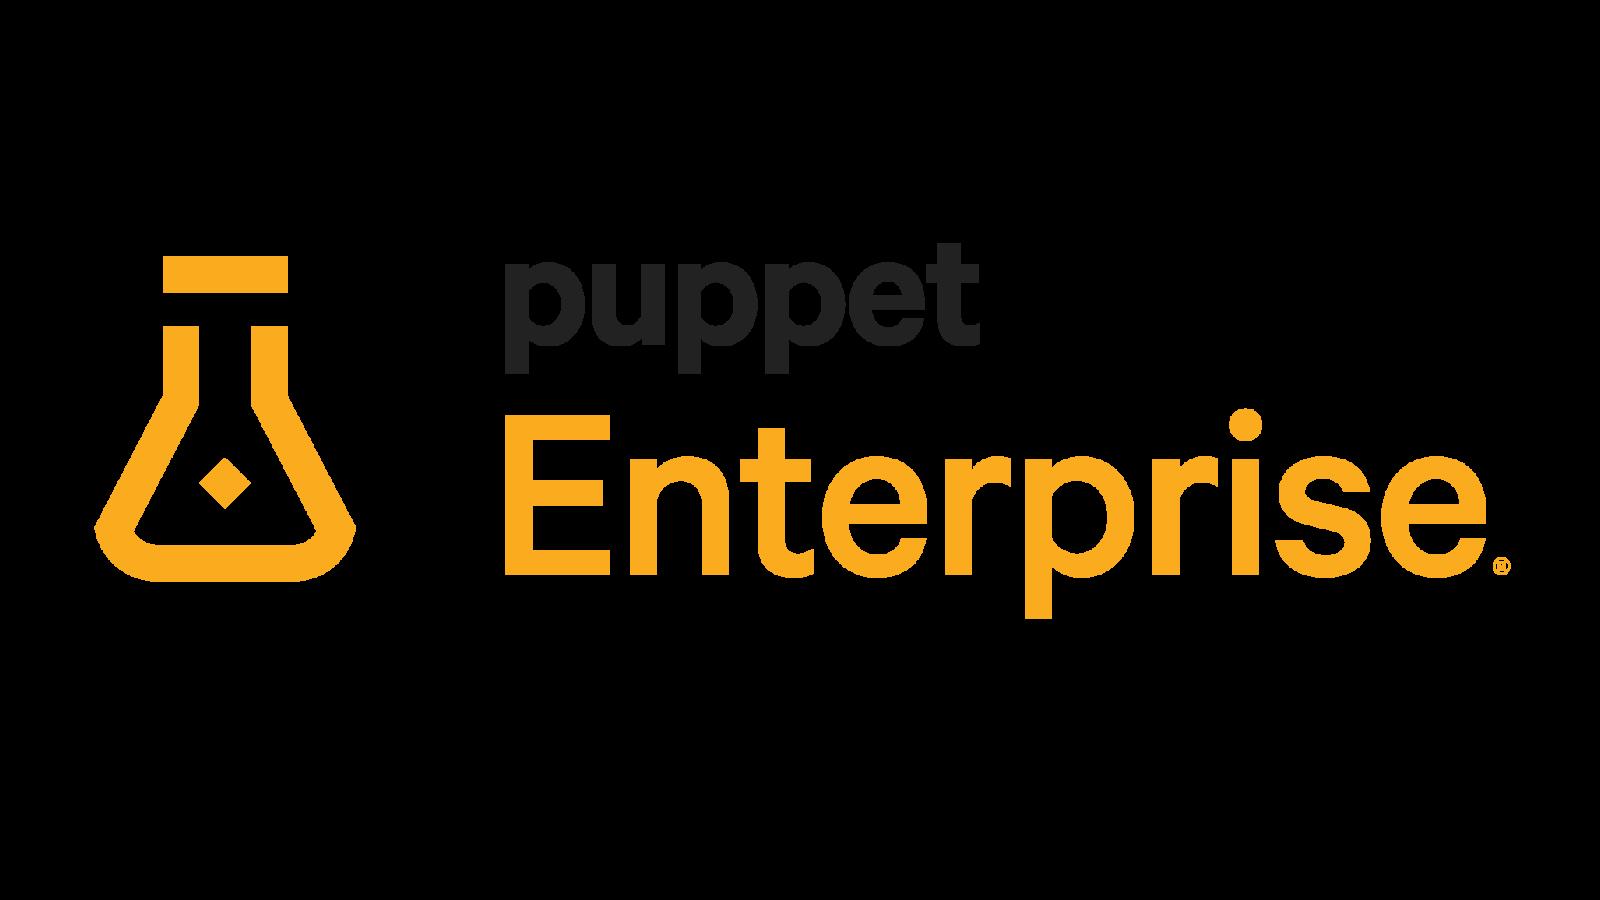 Puppet Enterprise logo